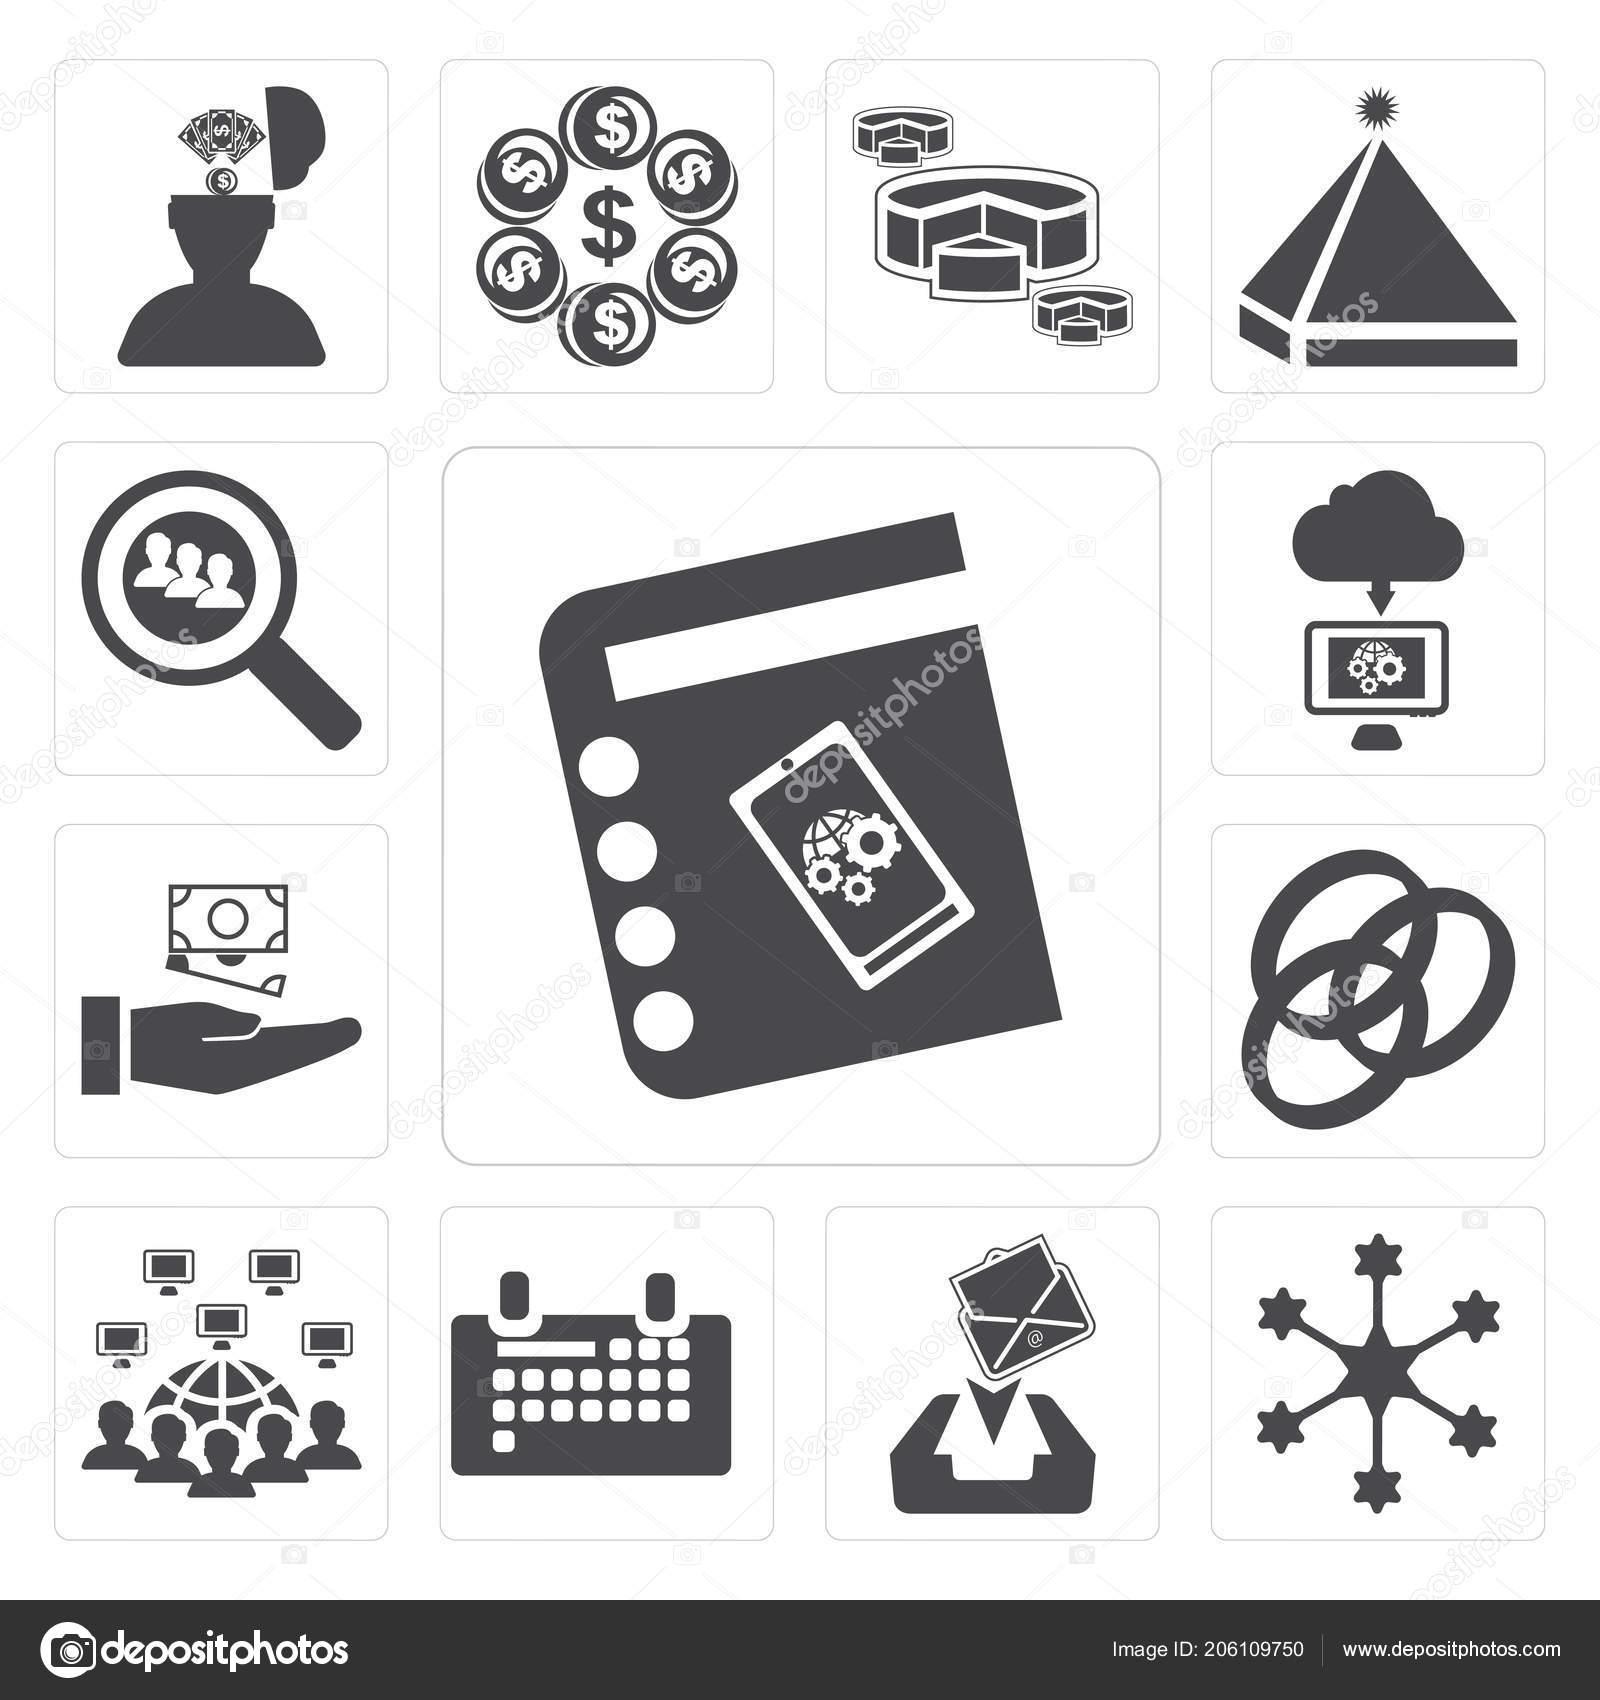 depositphotos_206109750 stock photo set simple editable icons agenda set simple editable icons agenda diagram receive calendar networking